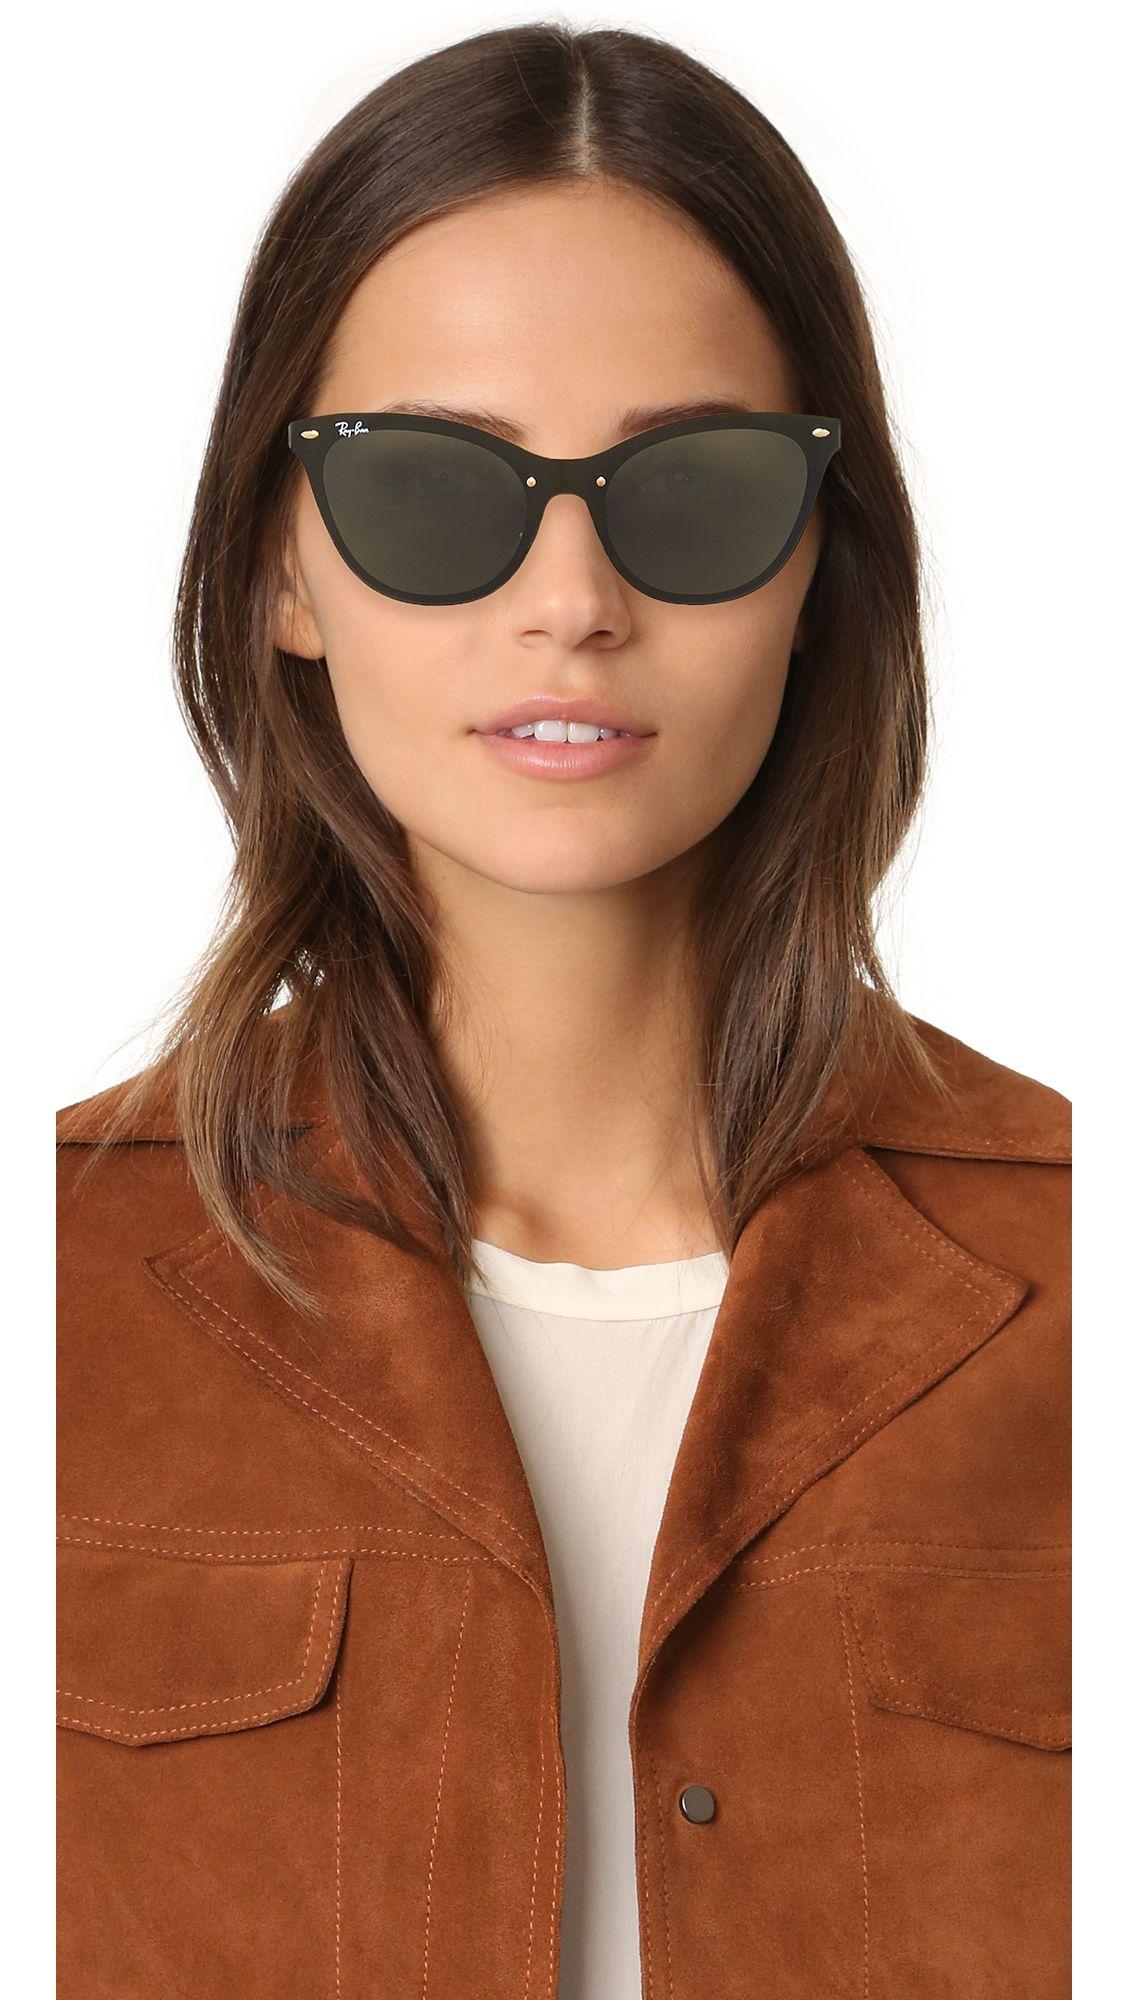 c62adddea72 Ray-Ban Cat Eye Flat Sunglasses